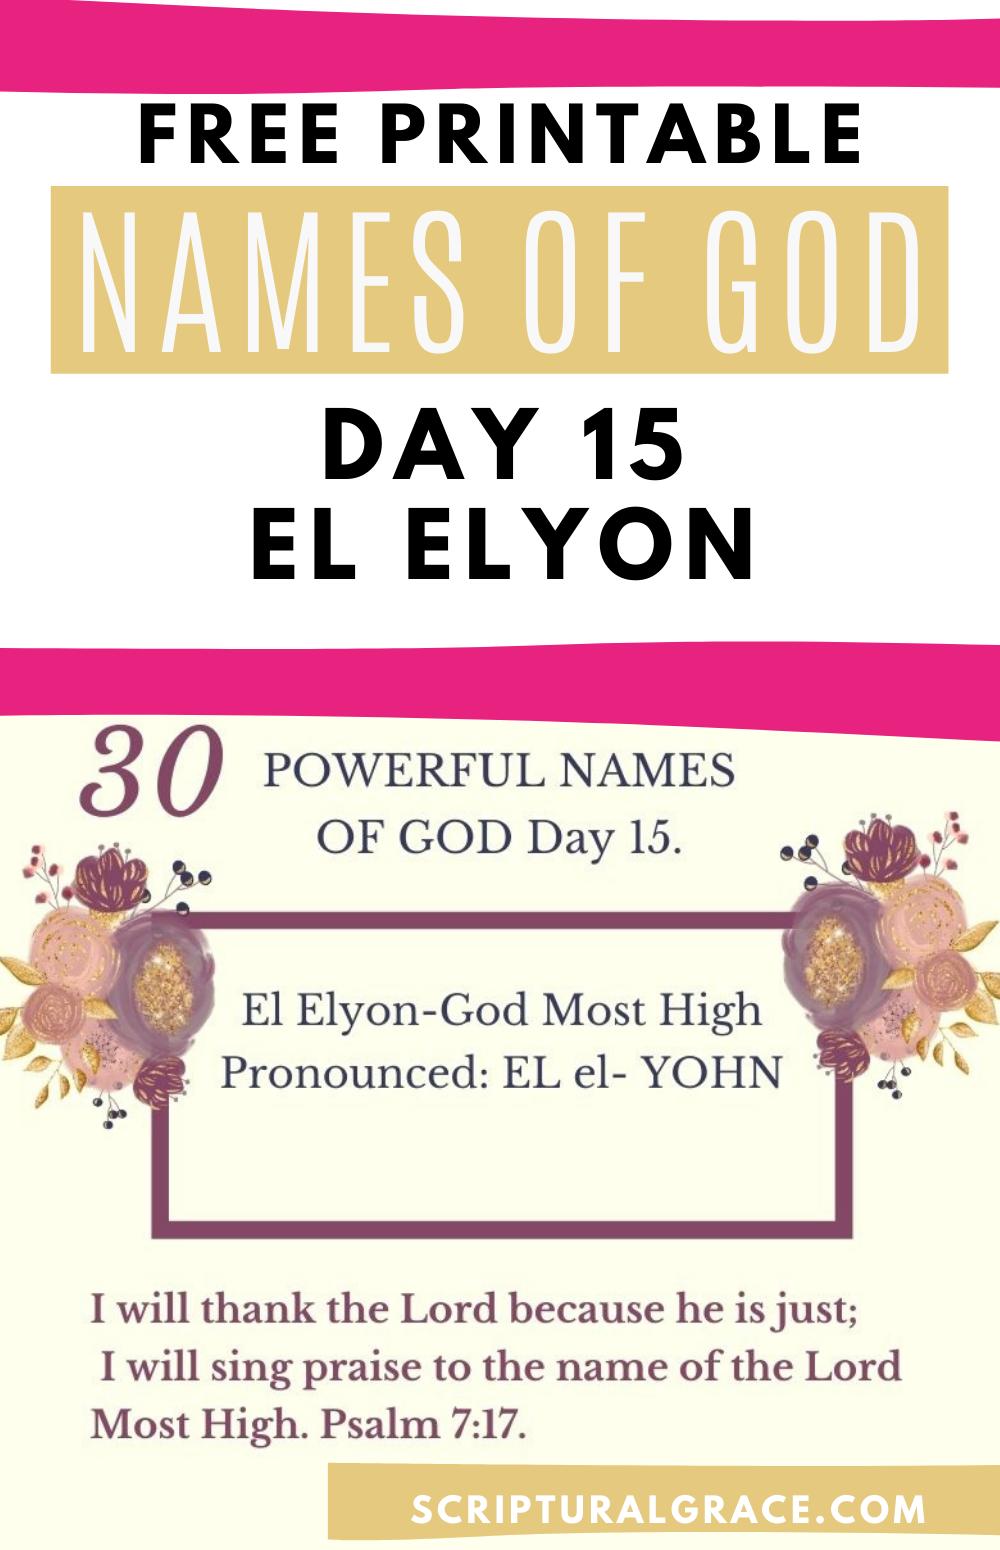 El Elyon Names of God day 15 free names of god chart and prayer journal